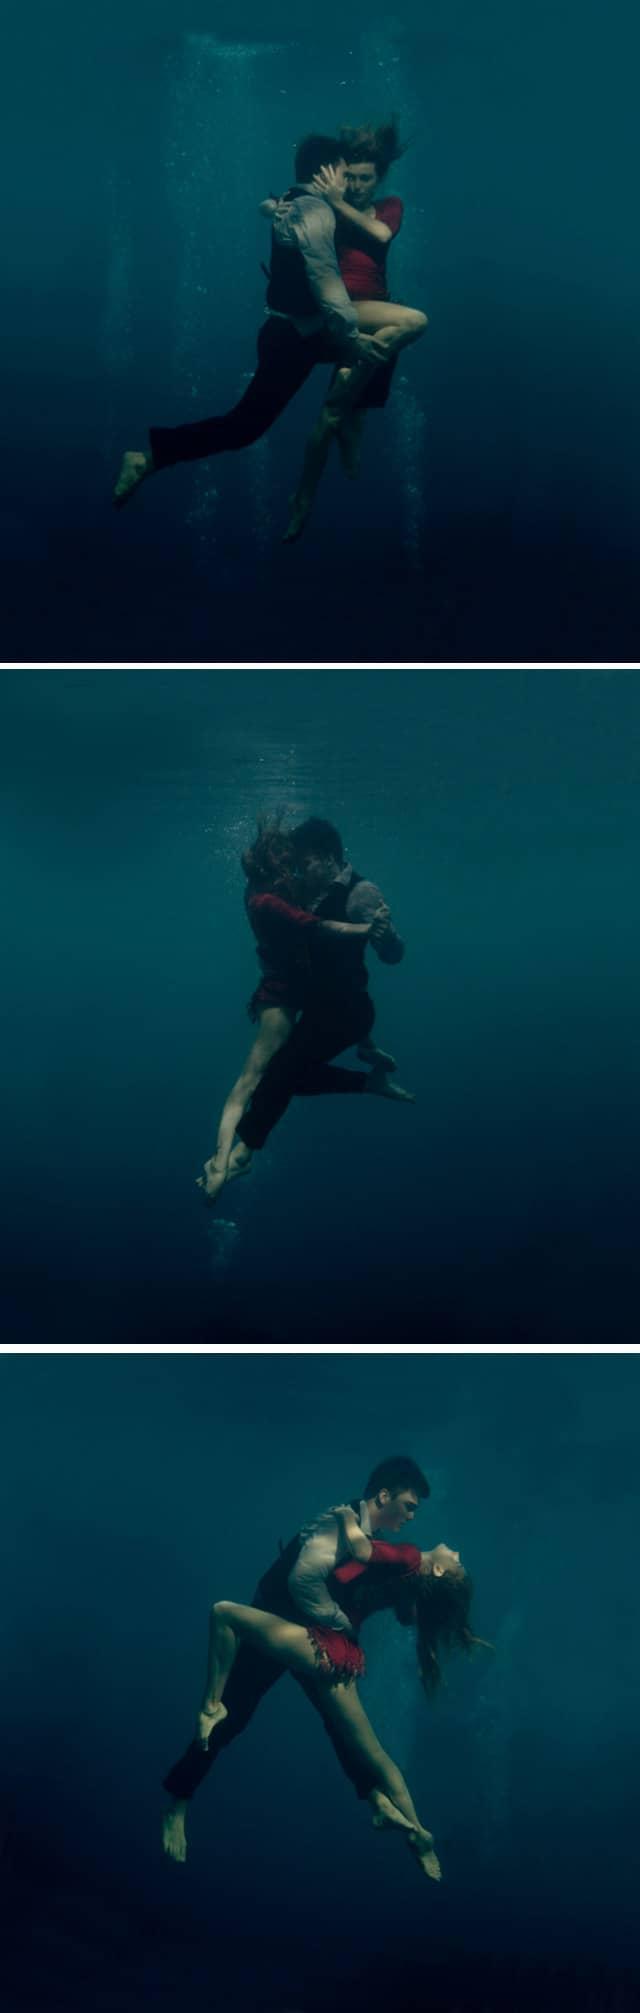 Fotógrafa retrata casal apaixonado dançando Tango debaixo d'água 3